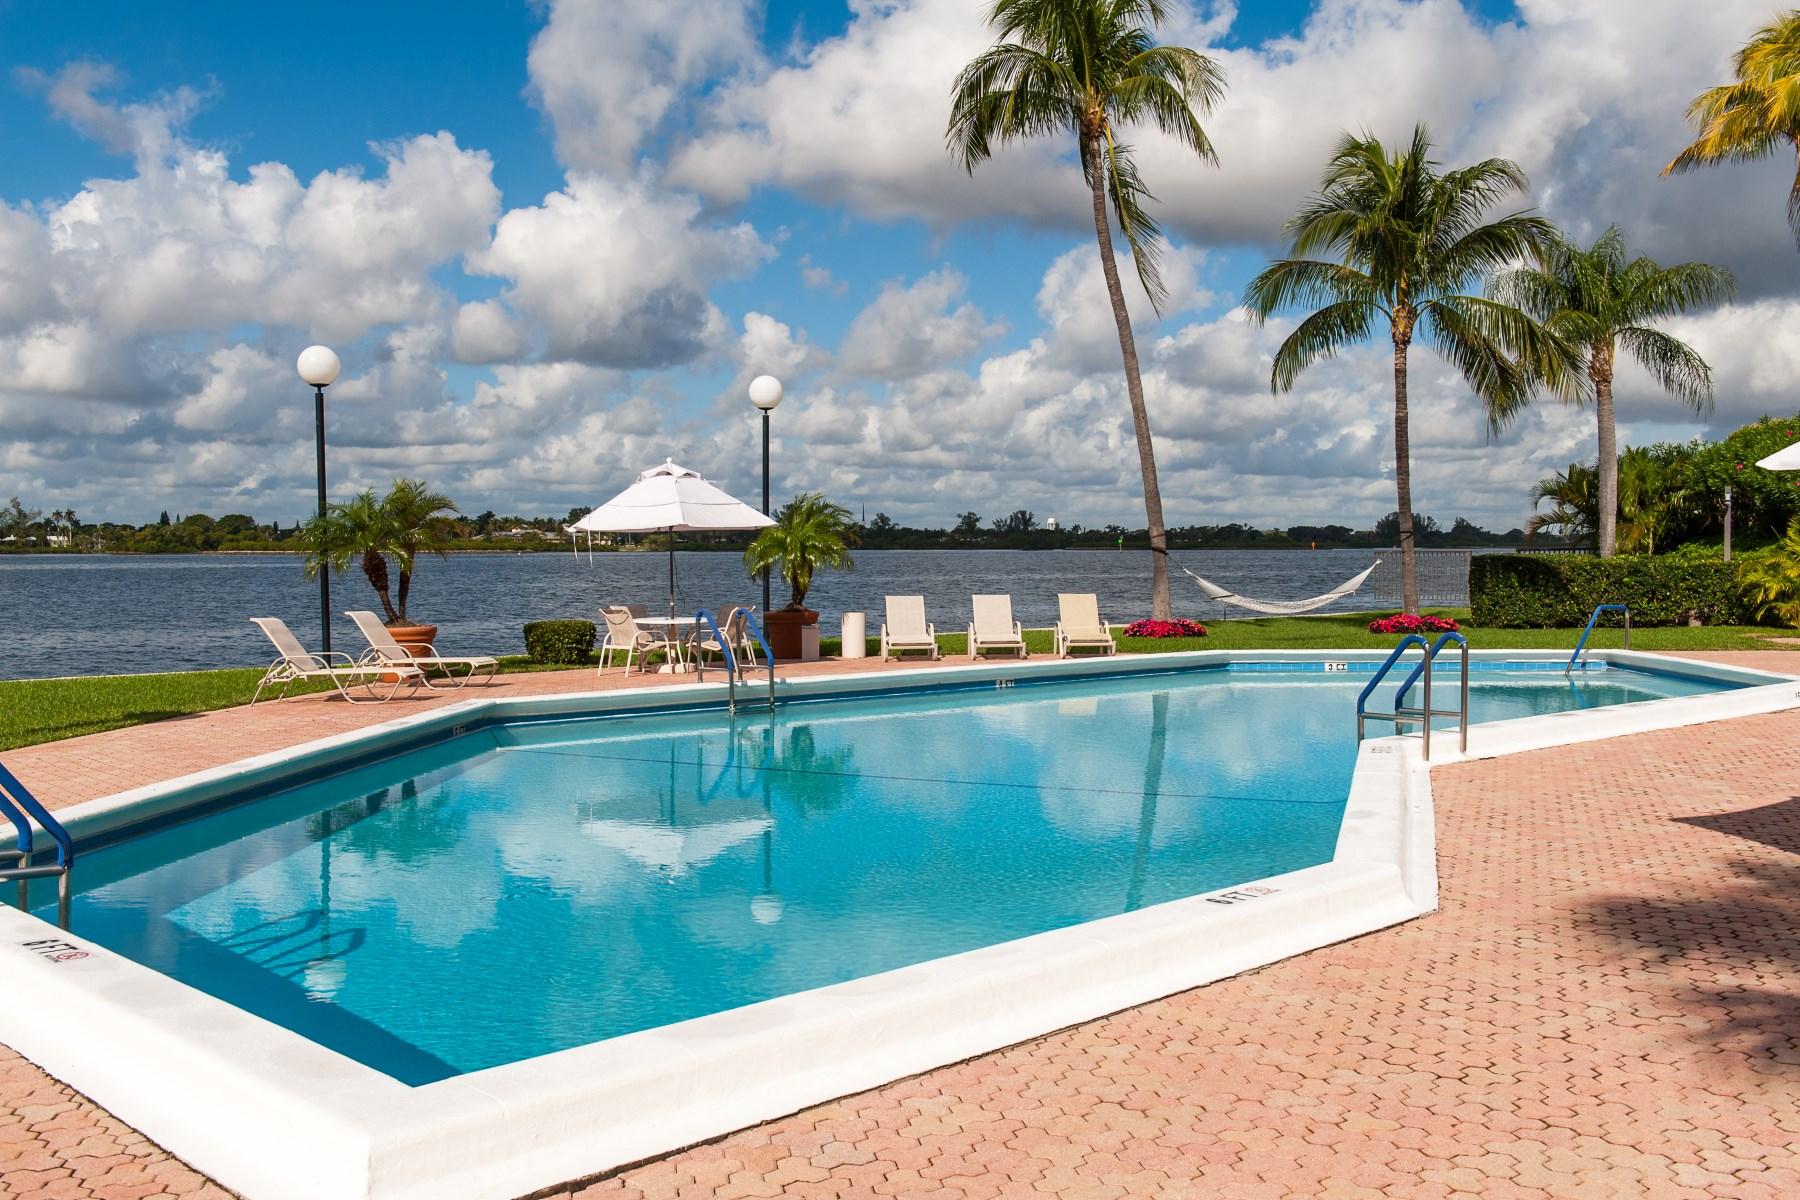 Condominium for Sale at Sutton Place Three Bedroom Palm Beach 2778 S Ocean Blvd Apt 205s Palm Beach, Florida 33480 United States